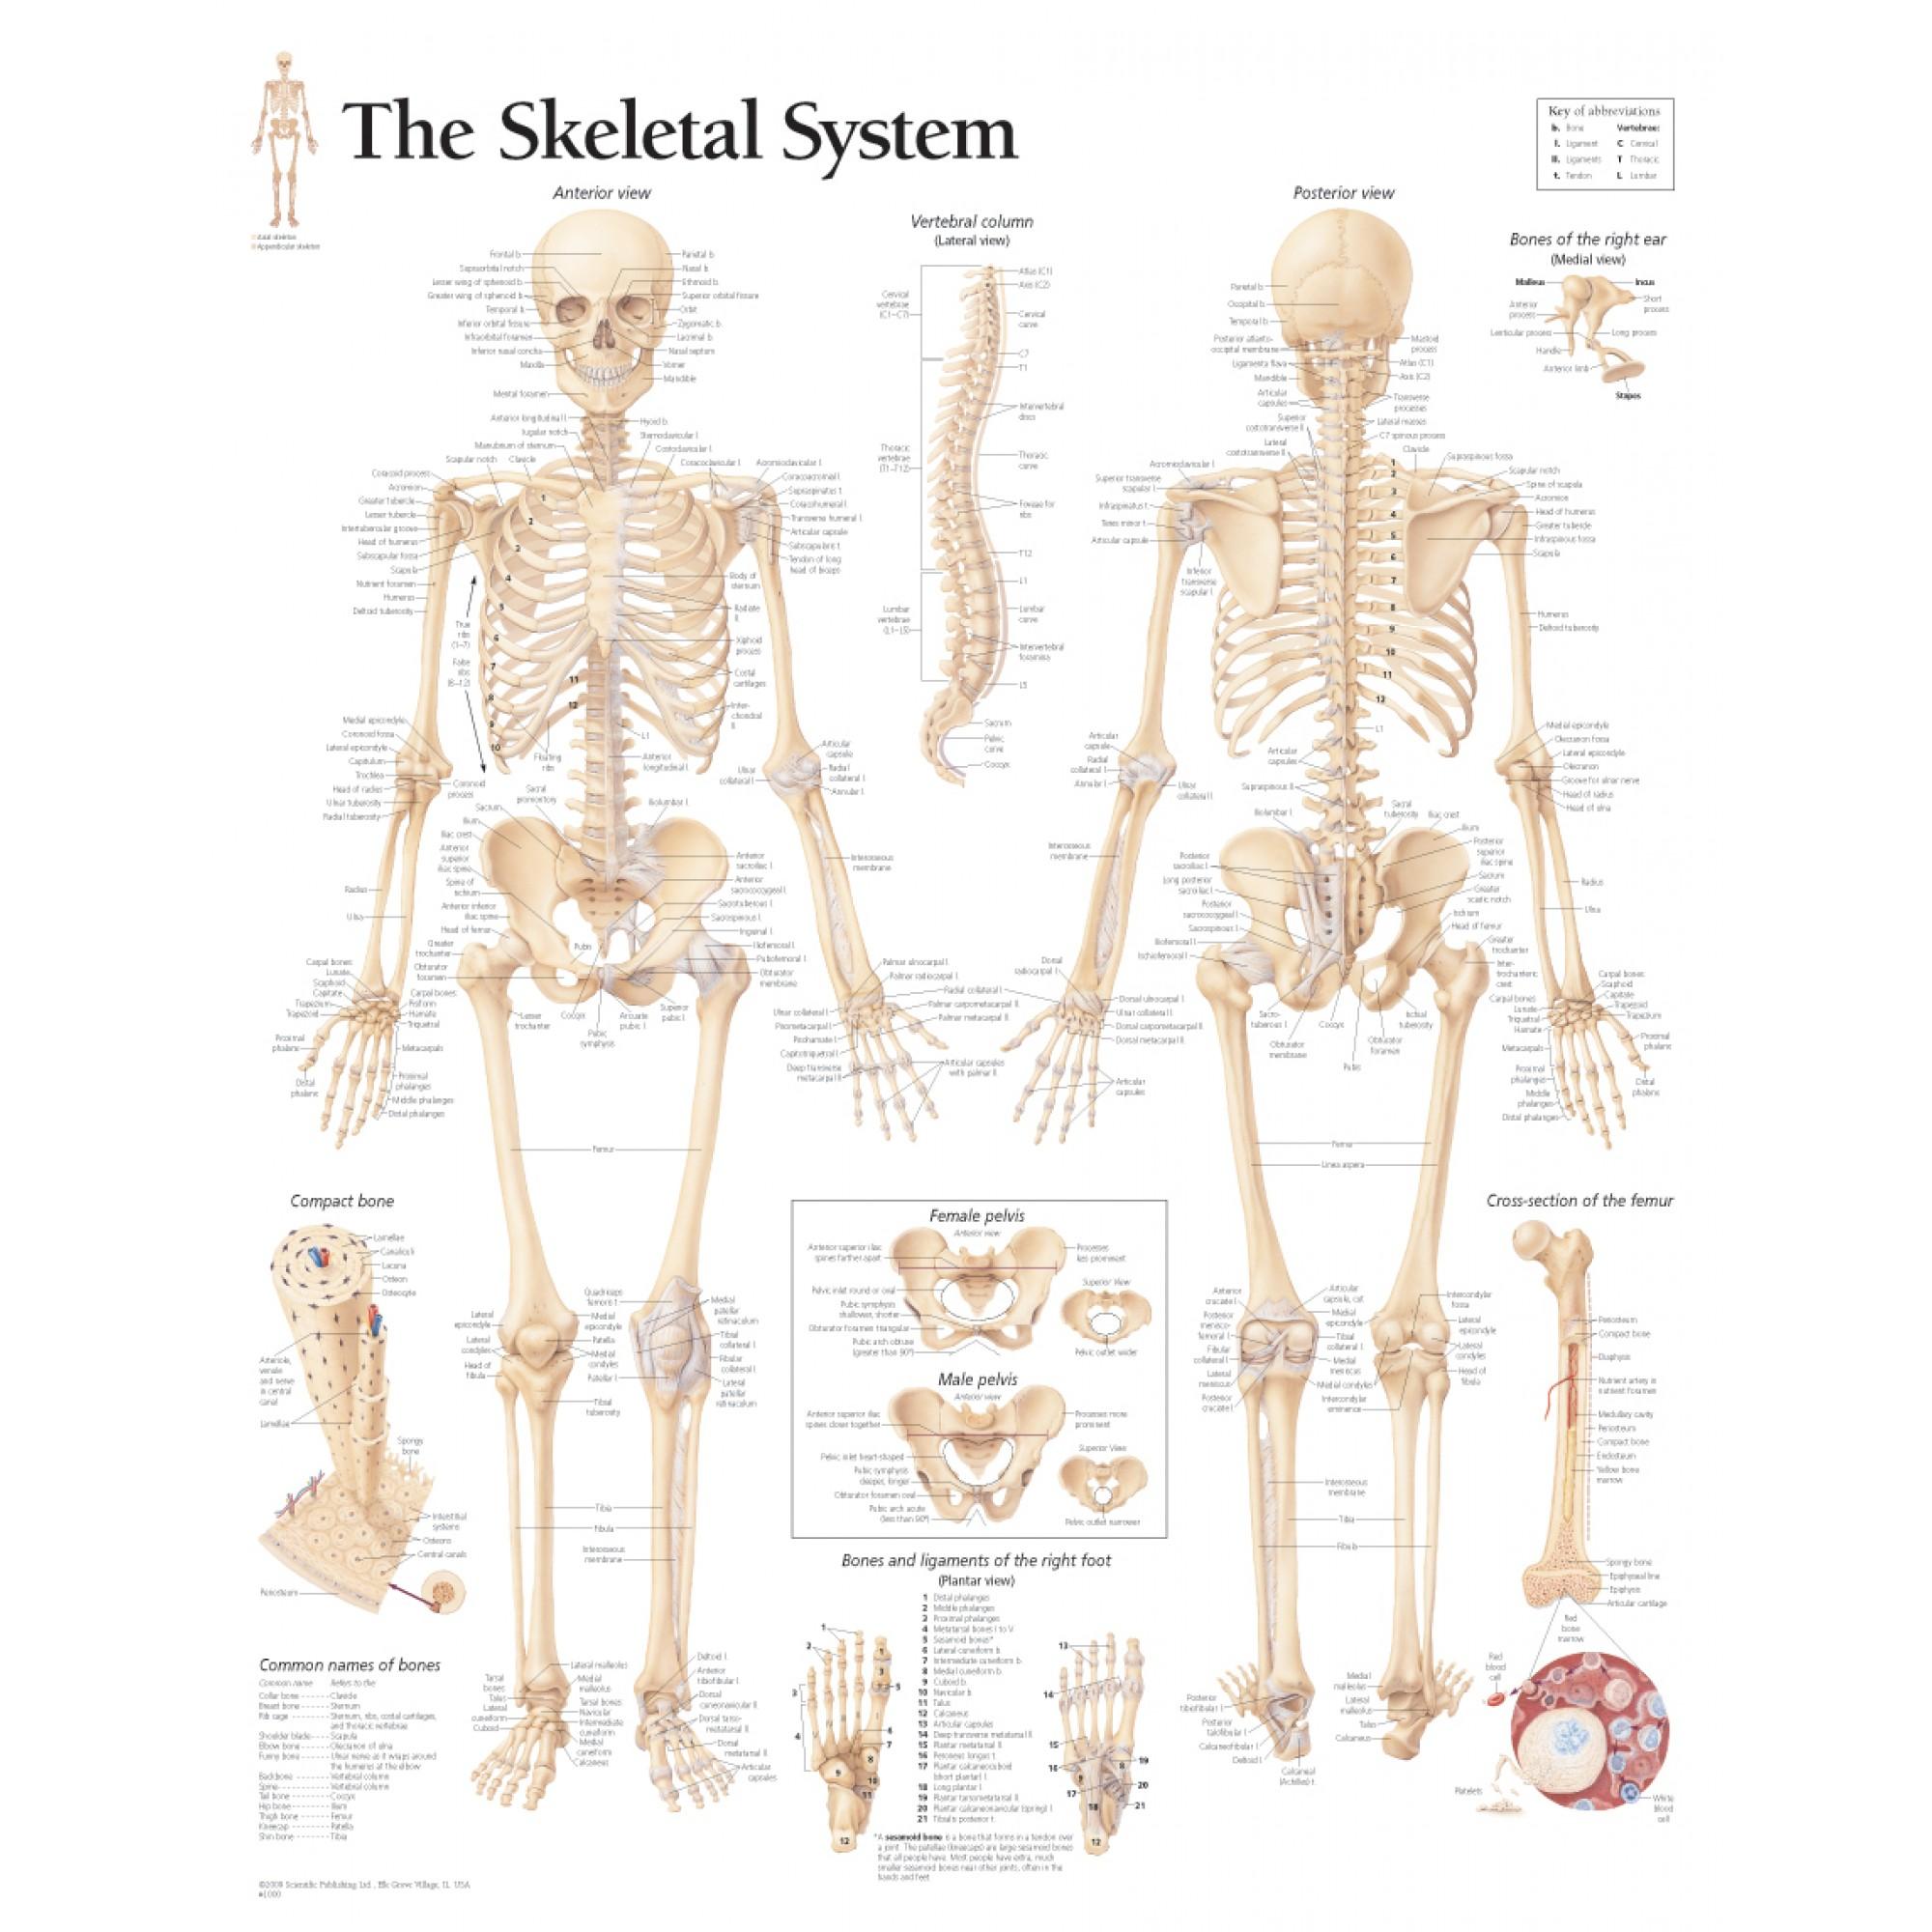 Skelettsystem Anatomie